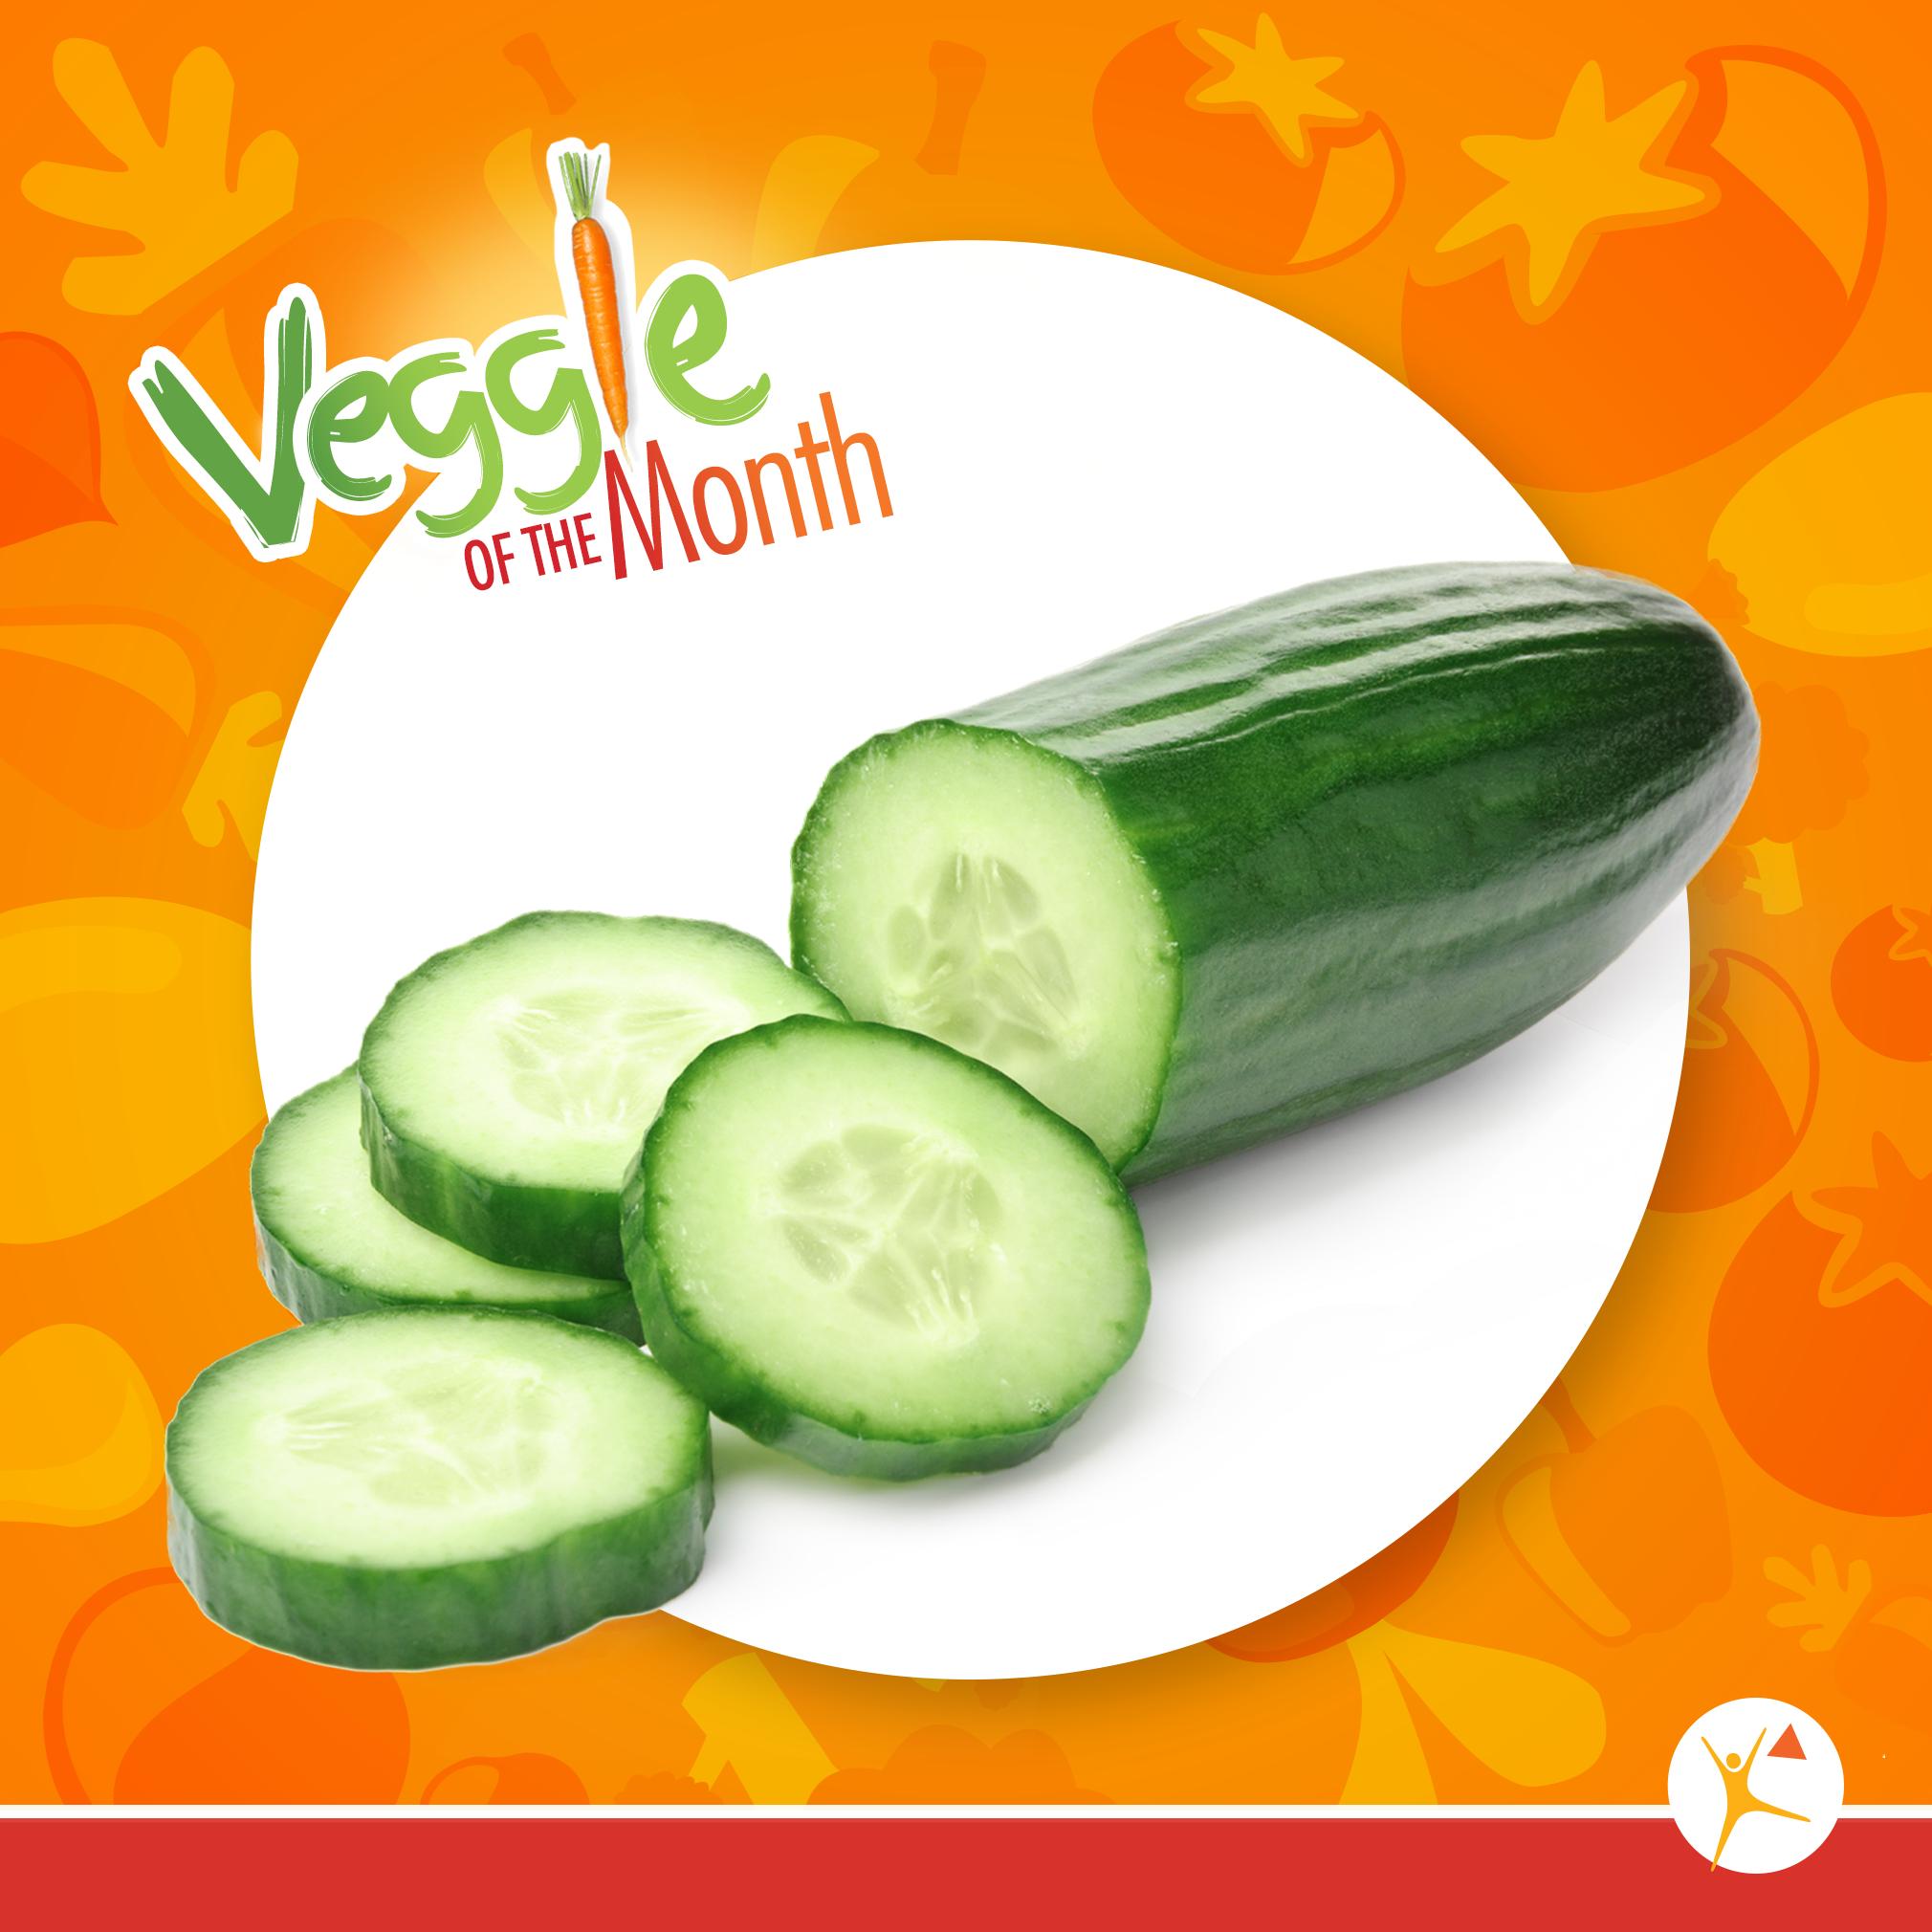 Veggie of the Month: Cucumber